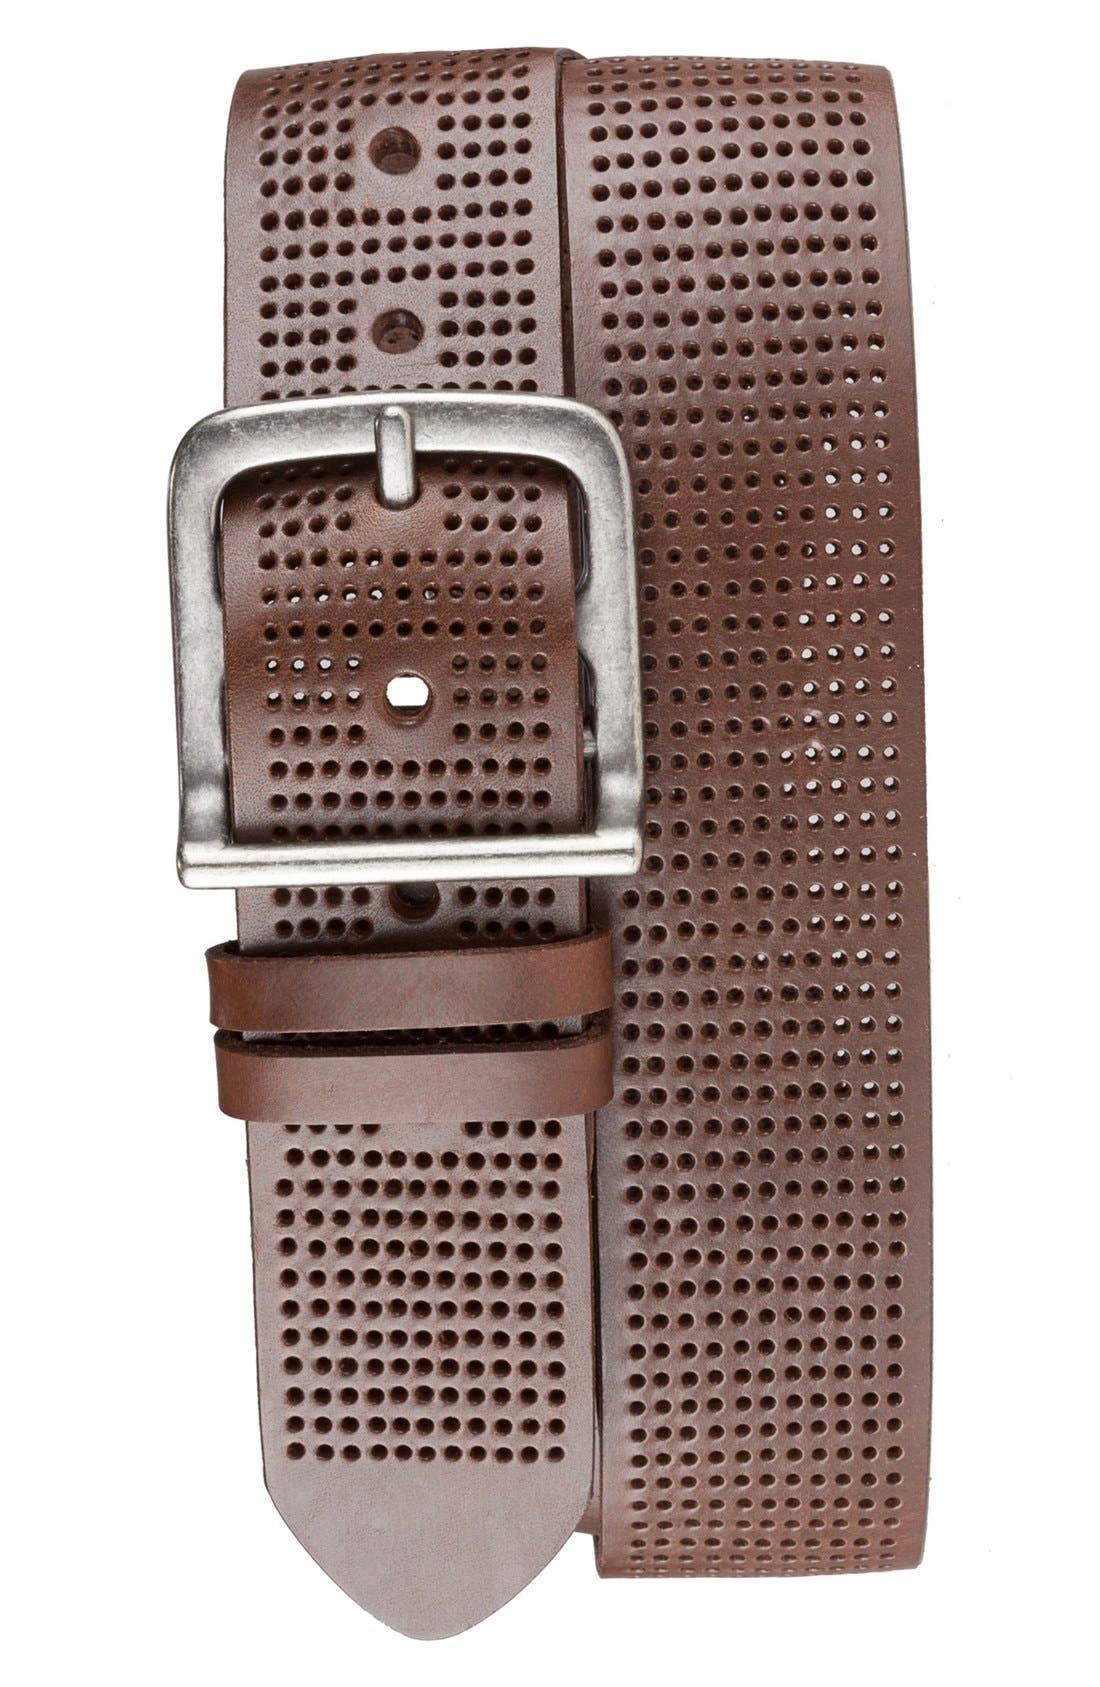 Alternate Image 1 Selected - Bill Adler 1981 Perforated Leather Belt